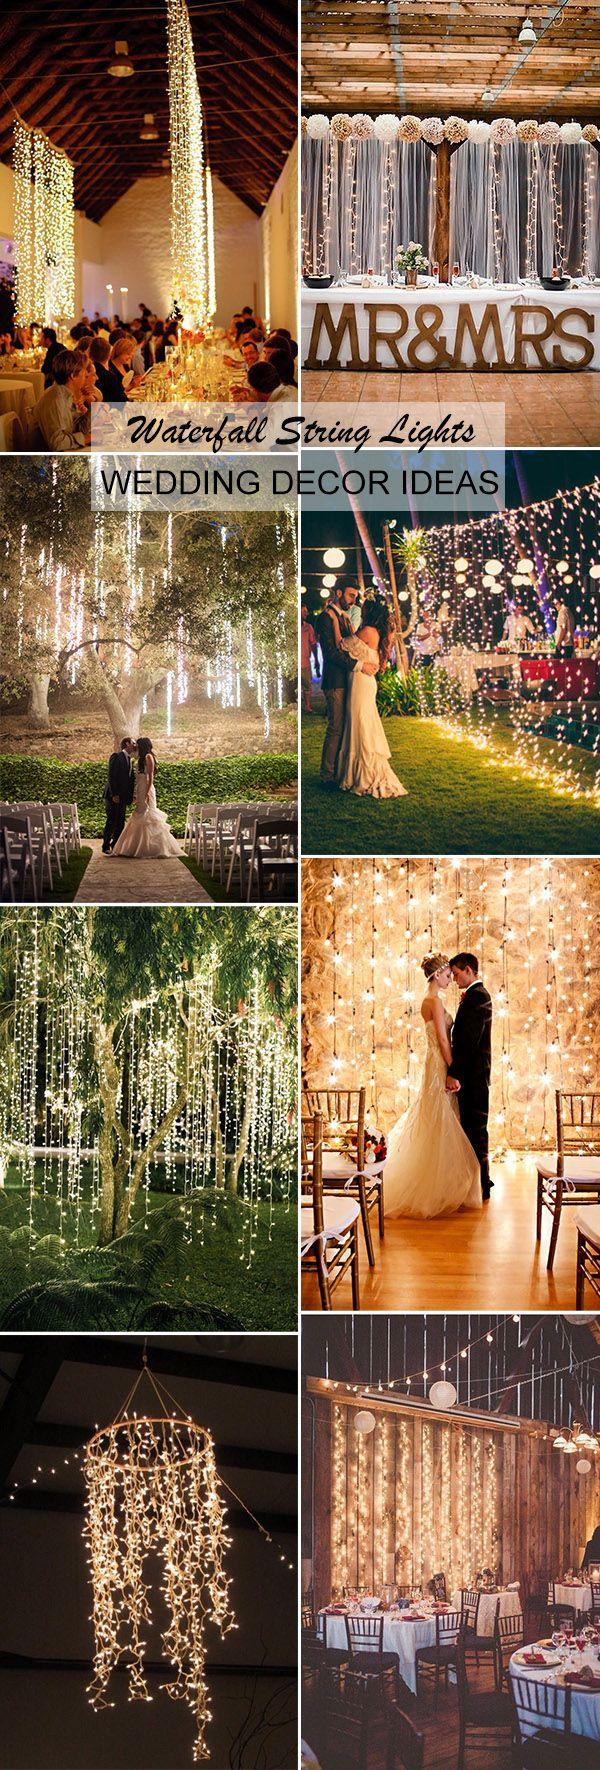 Creative and diy waterfall string lights wedding - String light decoration ideas ...